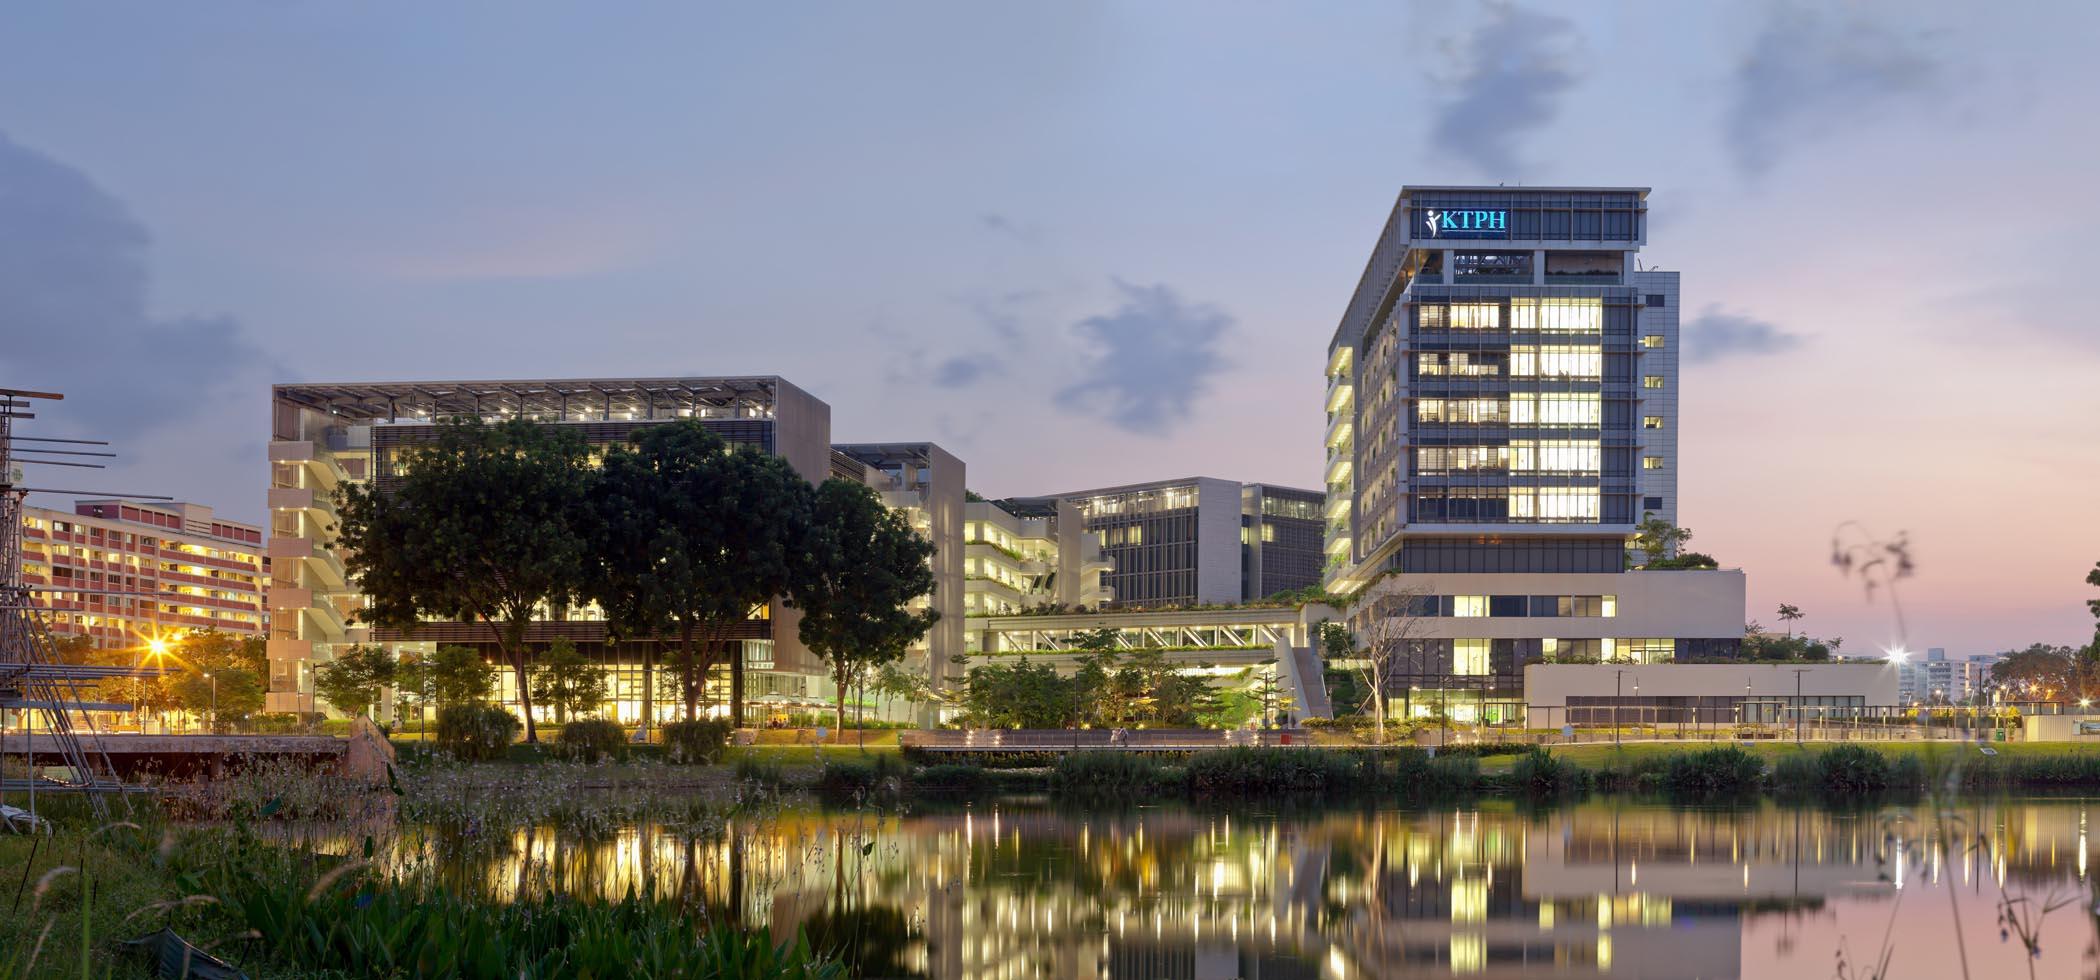 hospital architecture khoo teck intelligent most puat modern hospitals matters rmjm singapore architects cooper